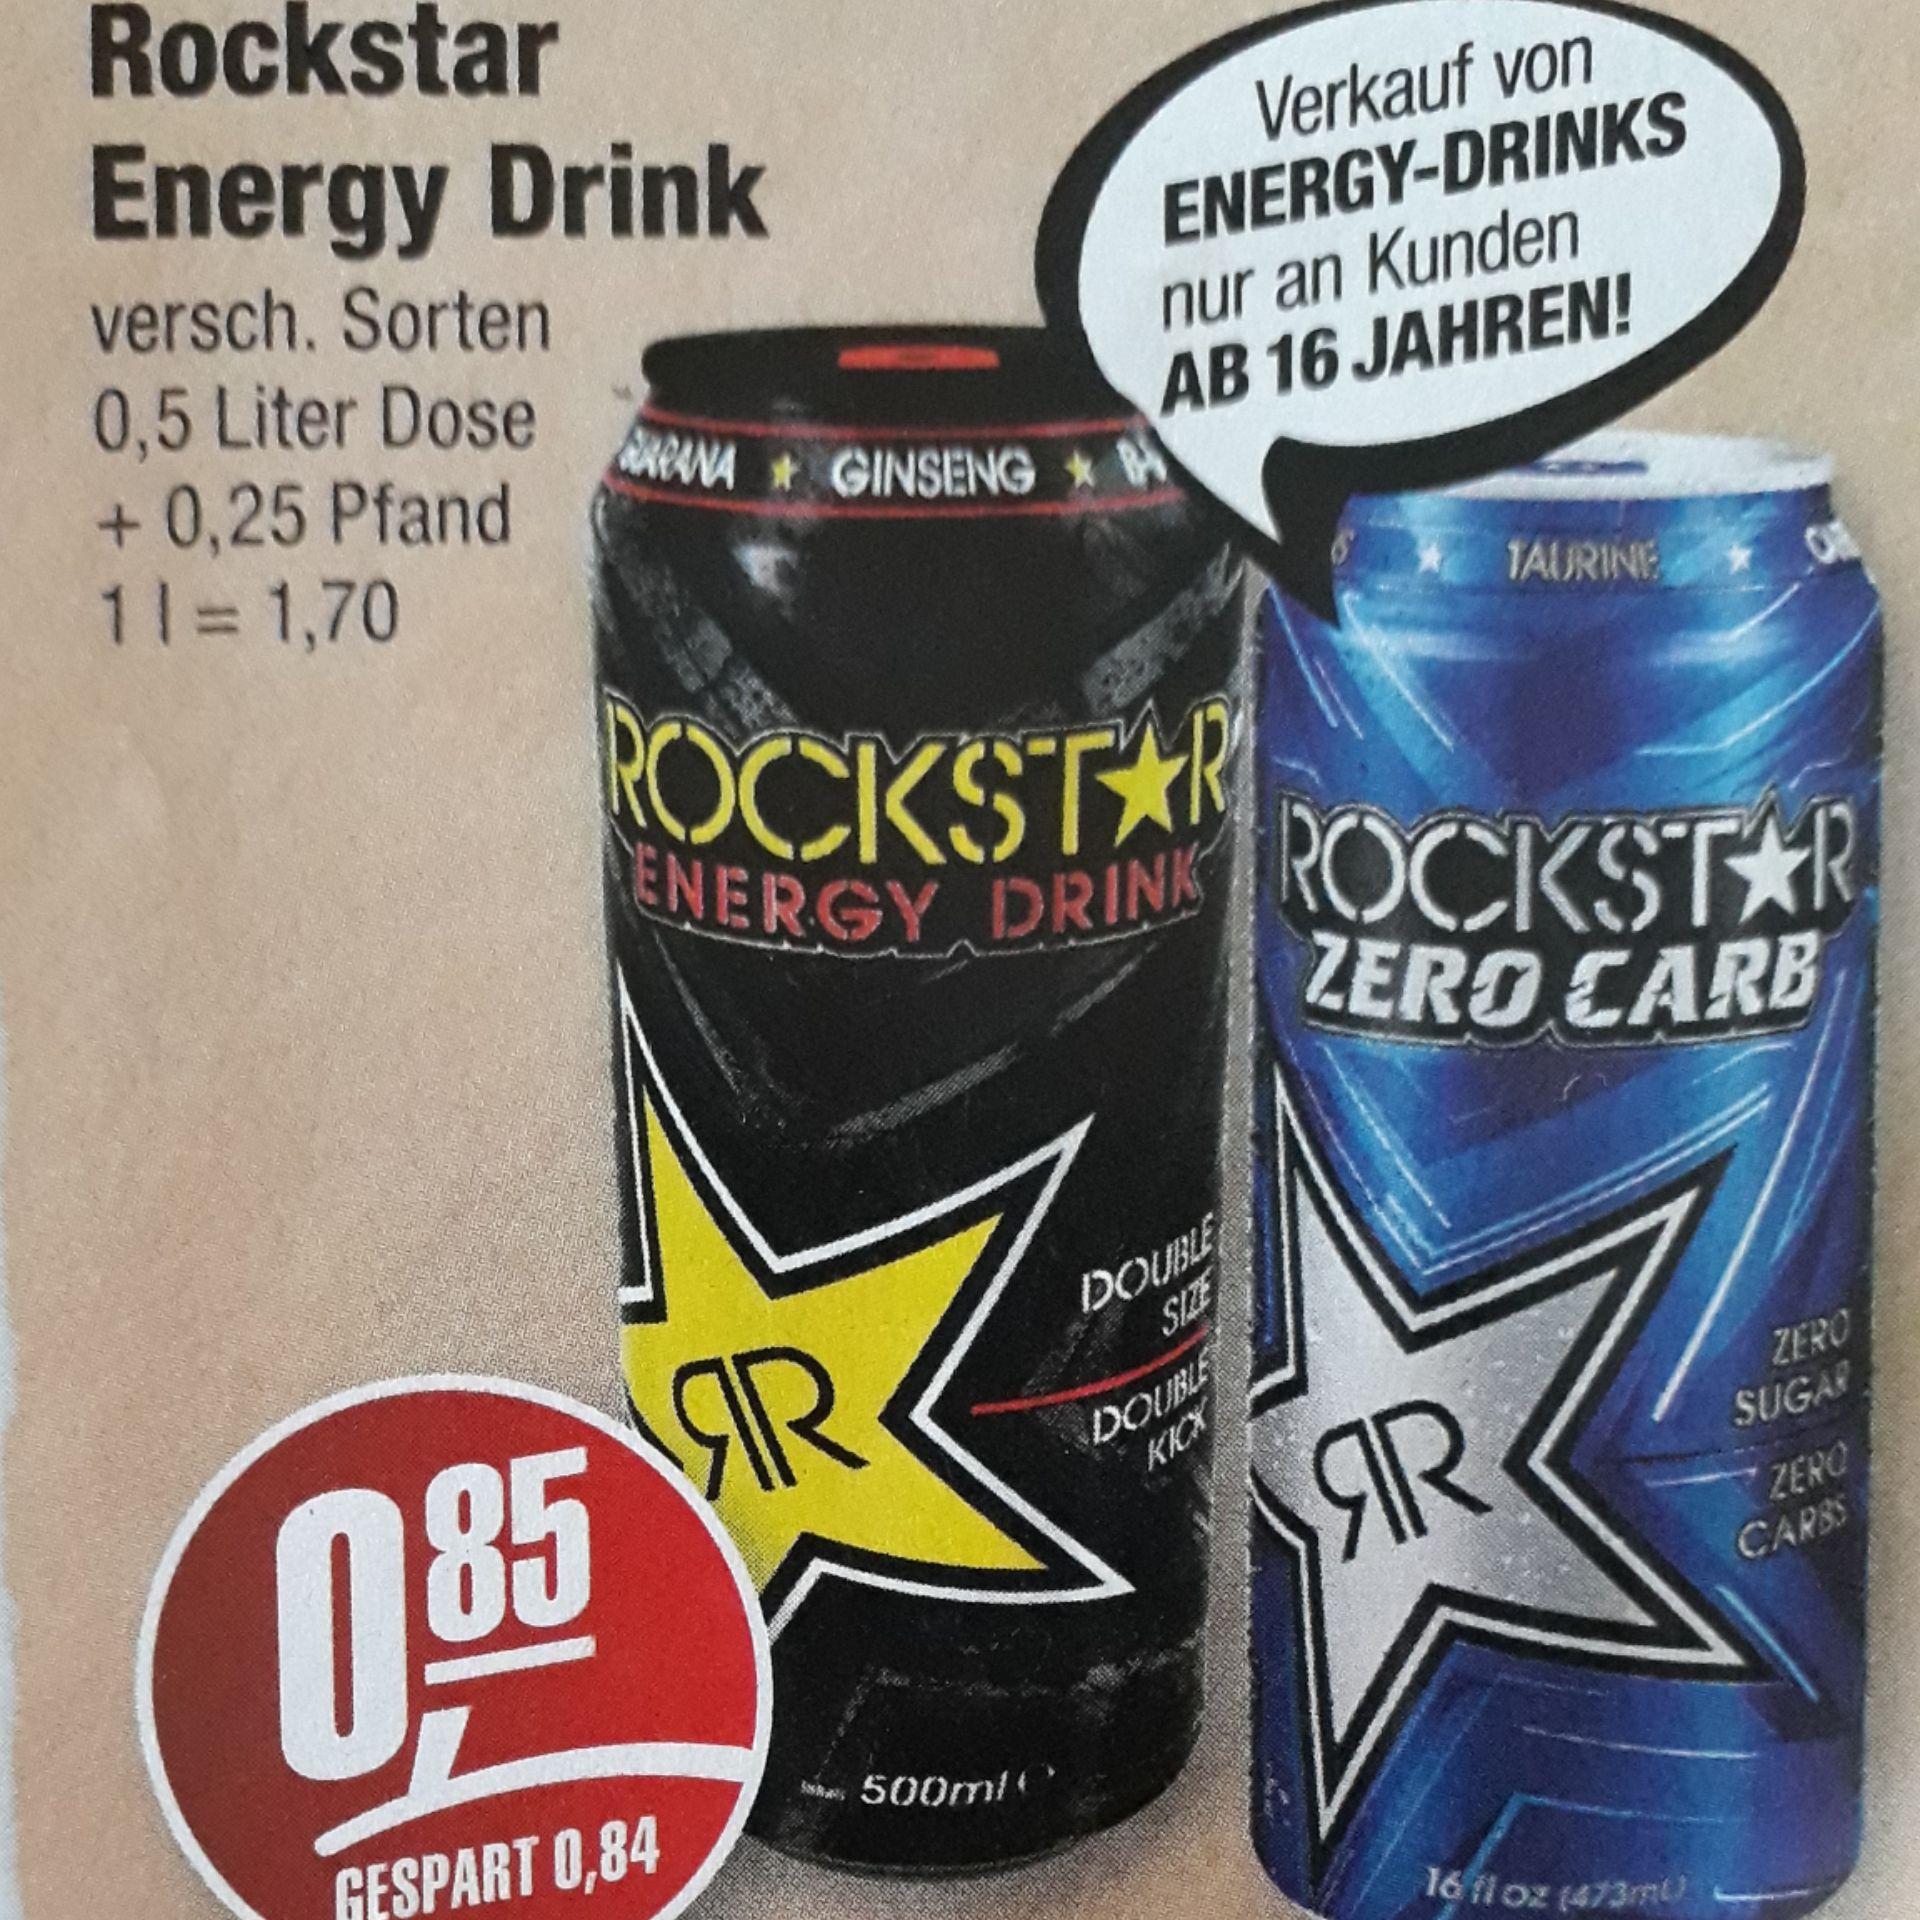 [Lokal Aue]Edeka Simmel - Rockstar Energy Drink nur 0,85€ statt 1,69€ + 0,25€ Pfand